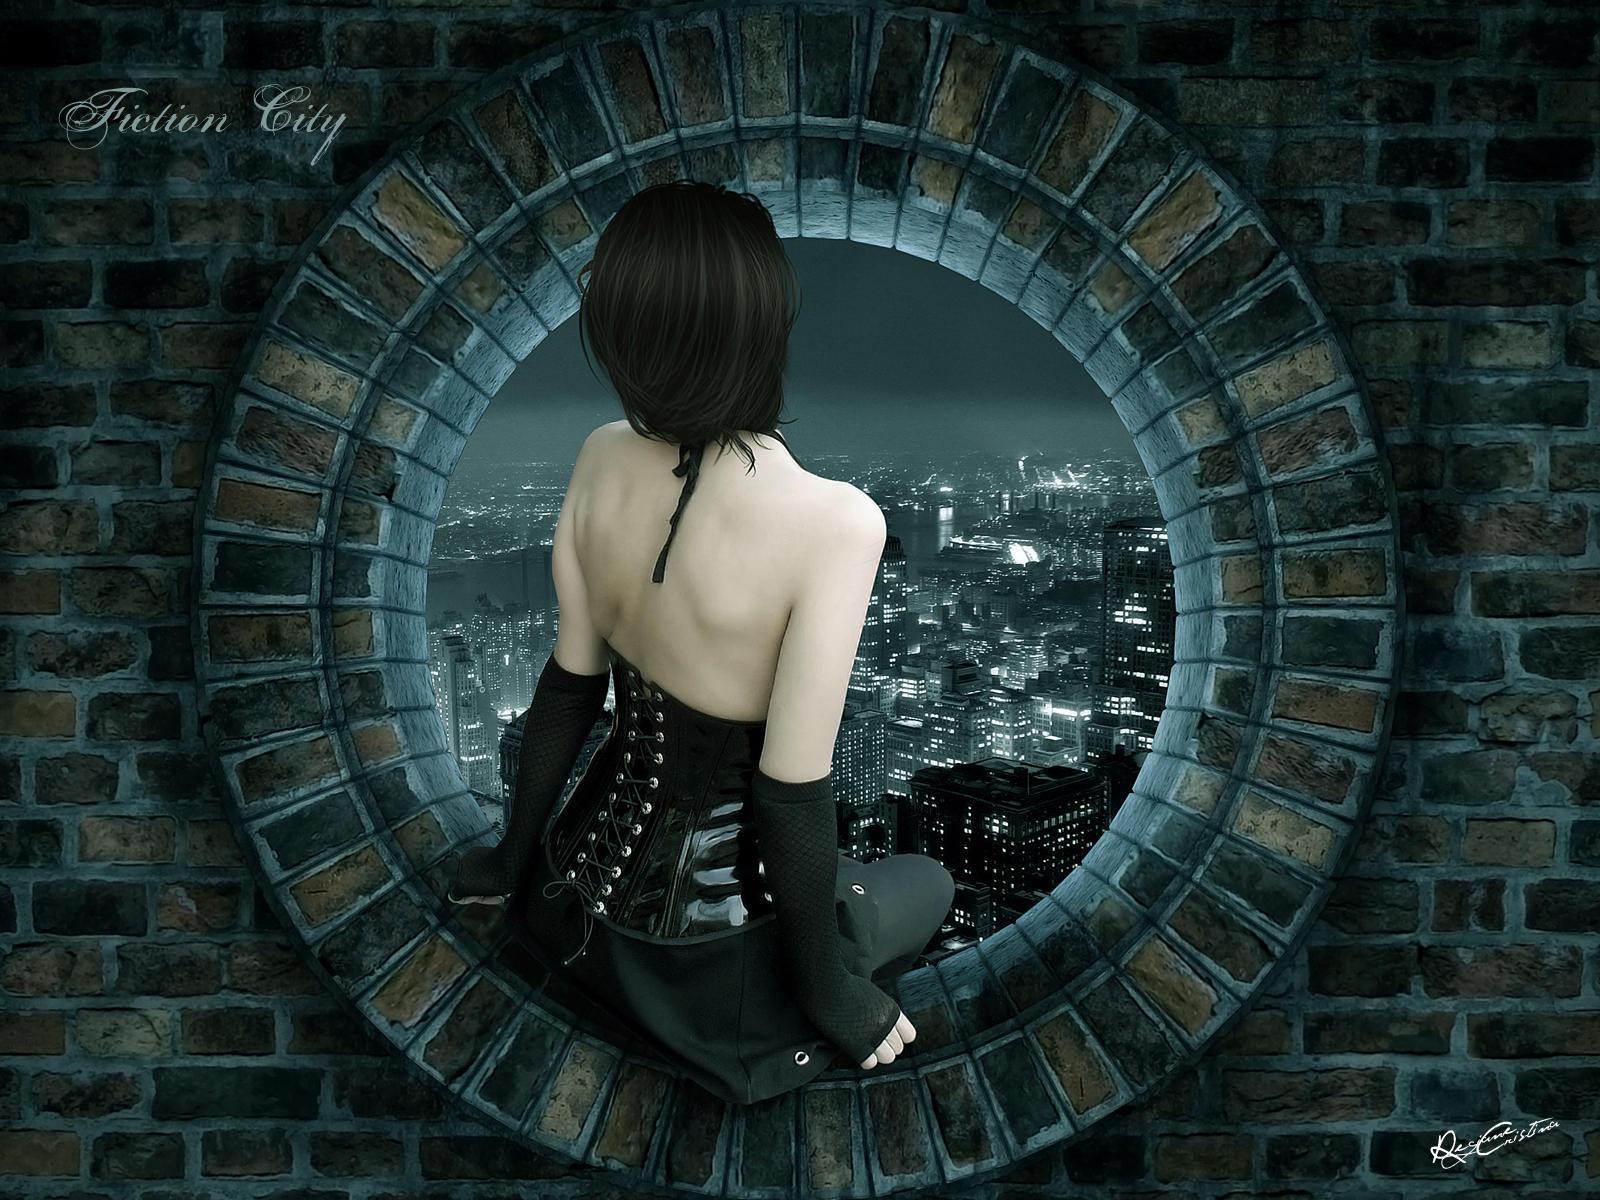 Fiction City - Wallpaper by desideriasp on DeviantArt